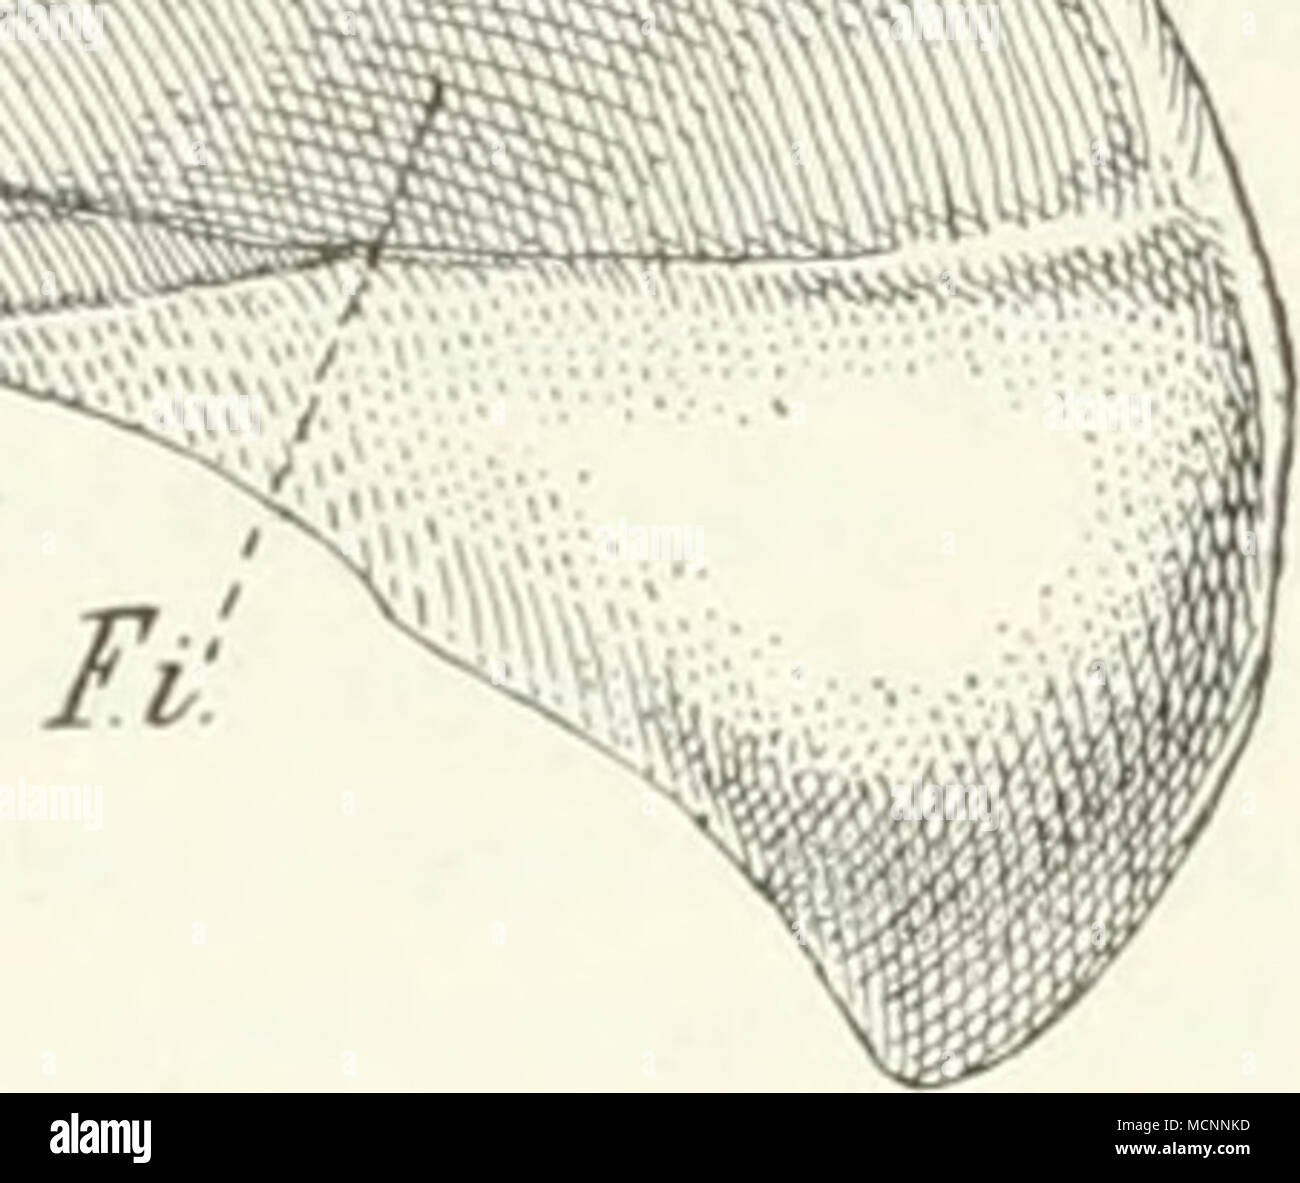 R A Fs Stock Photos Images Alamy Ossa Wiring Diagram Fig573 Tatusia Das Sternum Mit Pr Praesterniim Manuliriuni Pterni